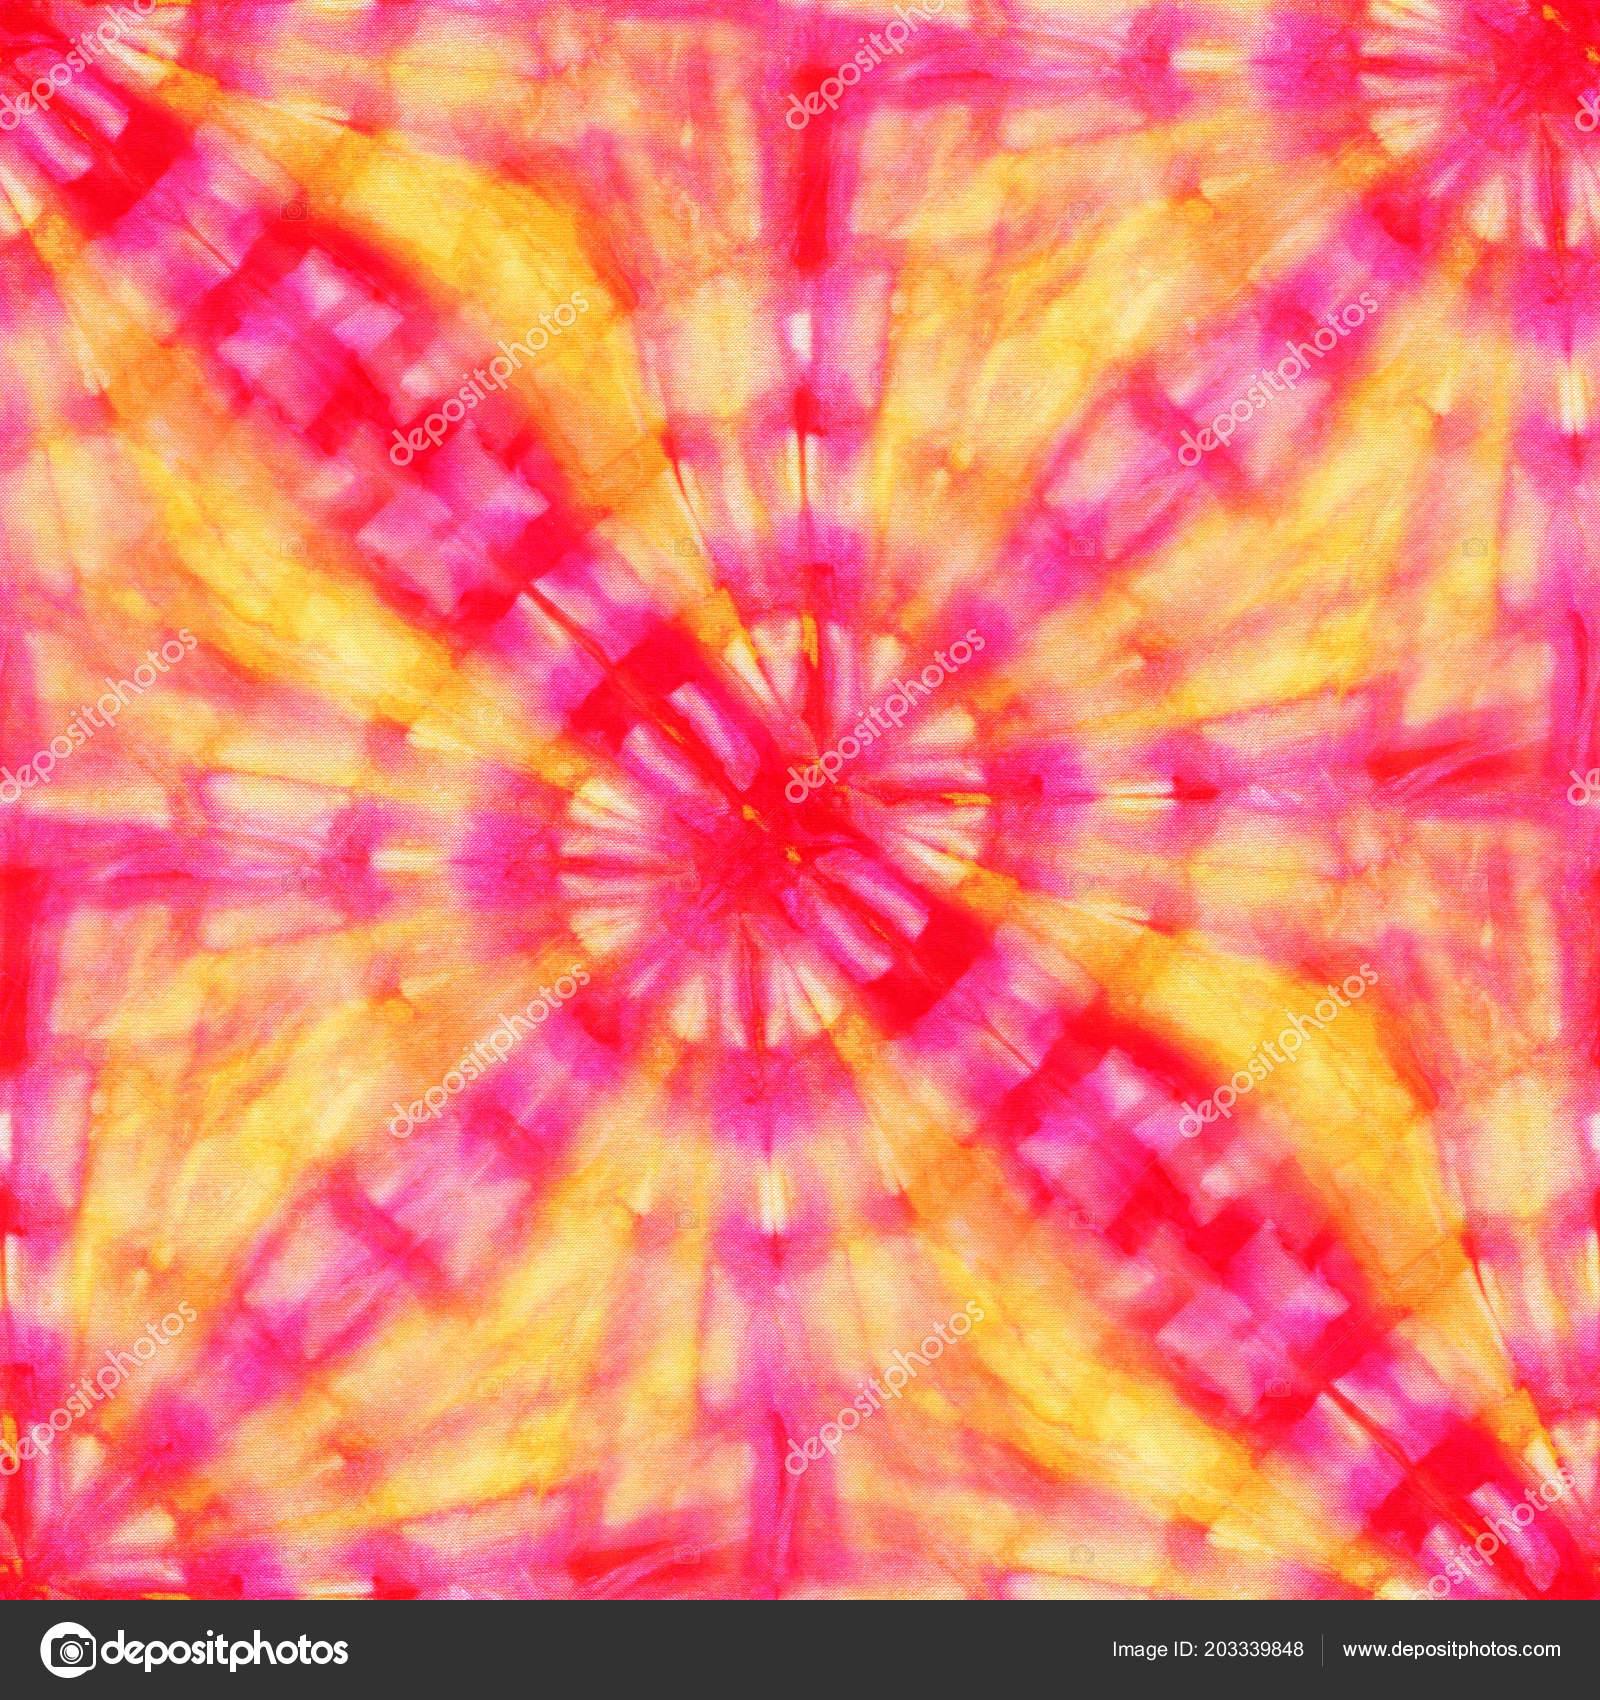 31722dc475b1 Seamless tie-dye pattern of red and yellow color on white silk. Hand  painting fabrics - nodular batik. Shibori dyeing.